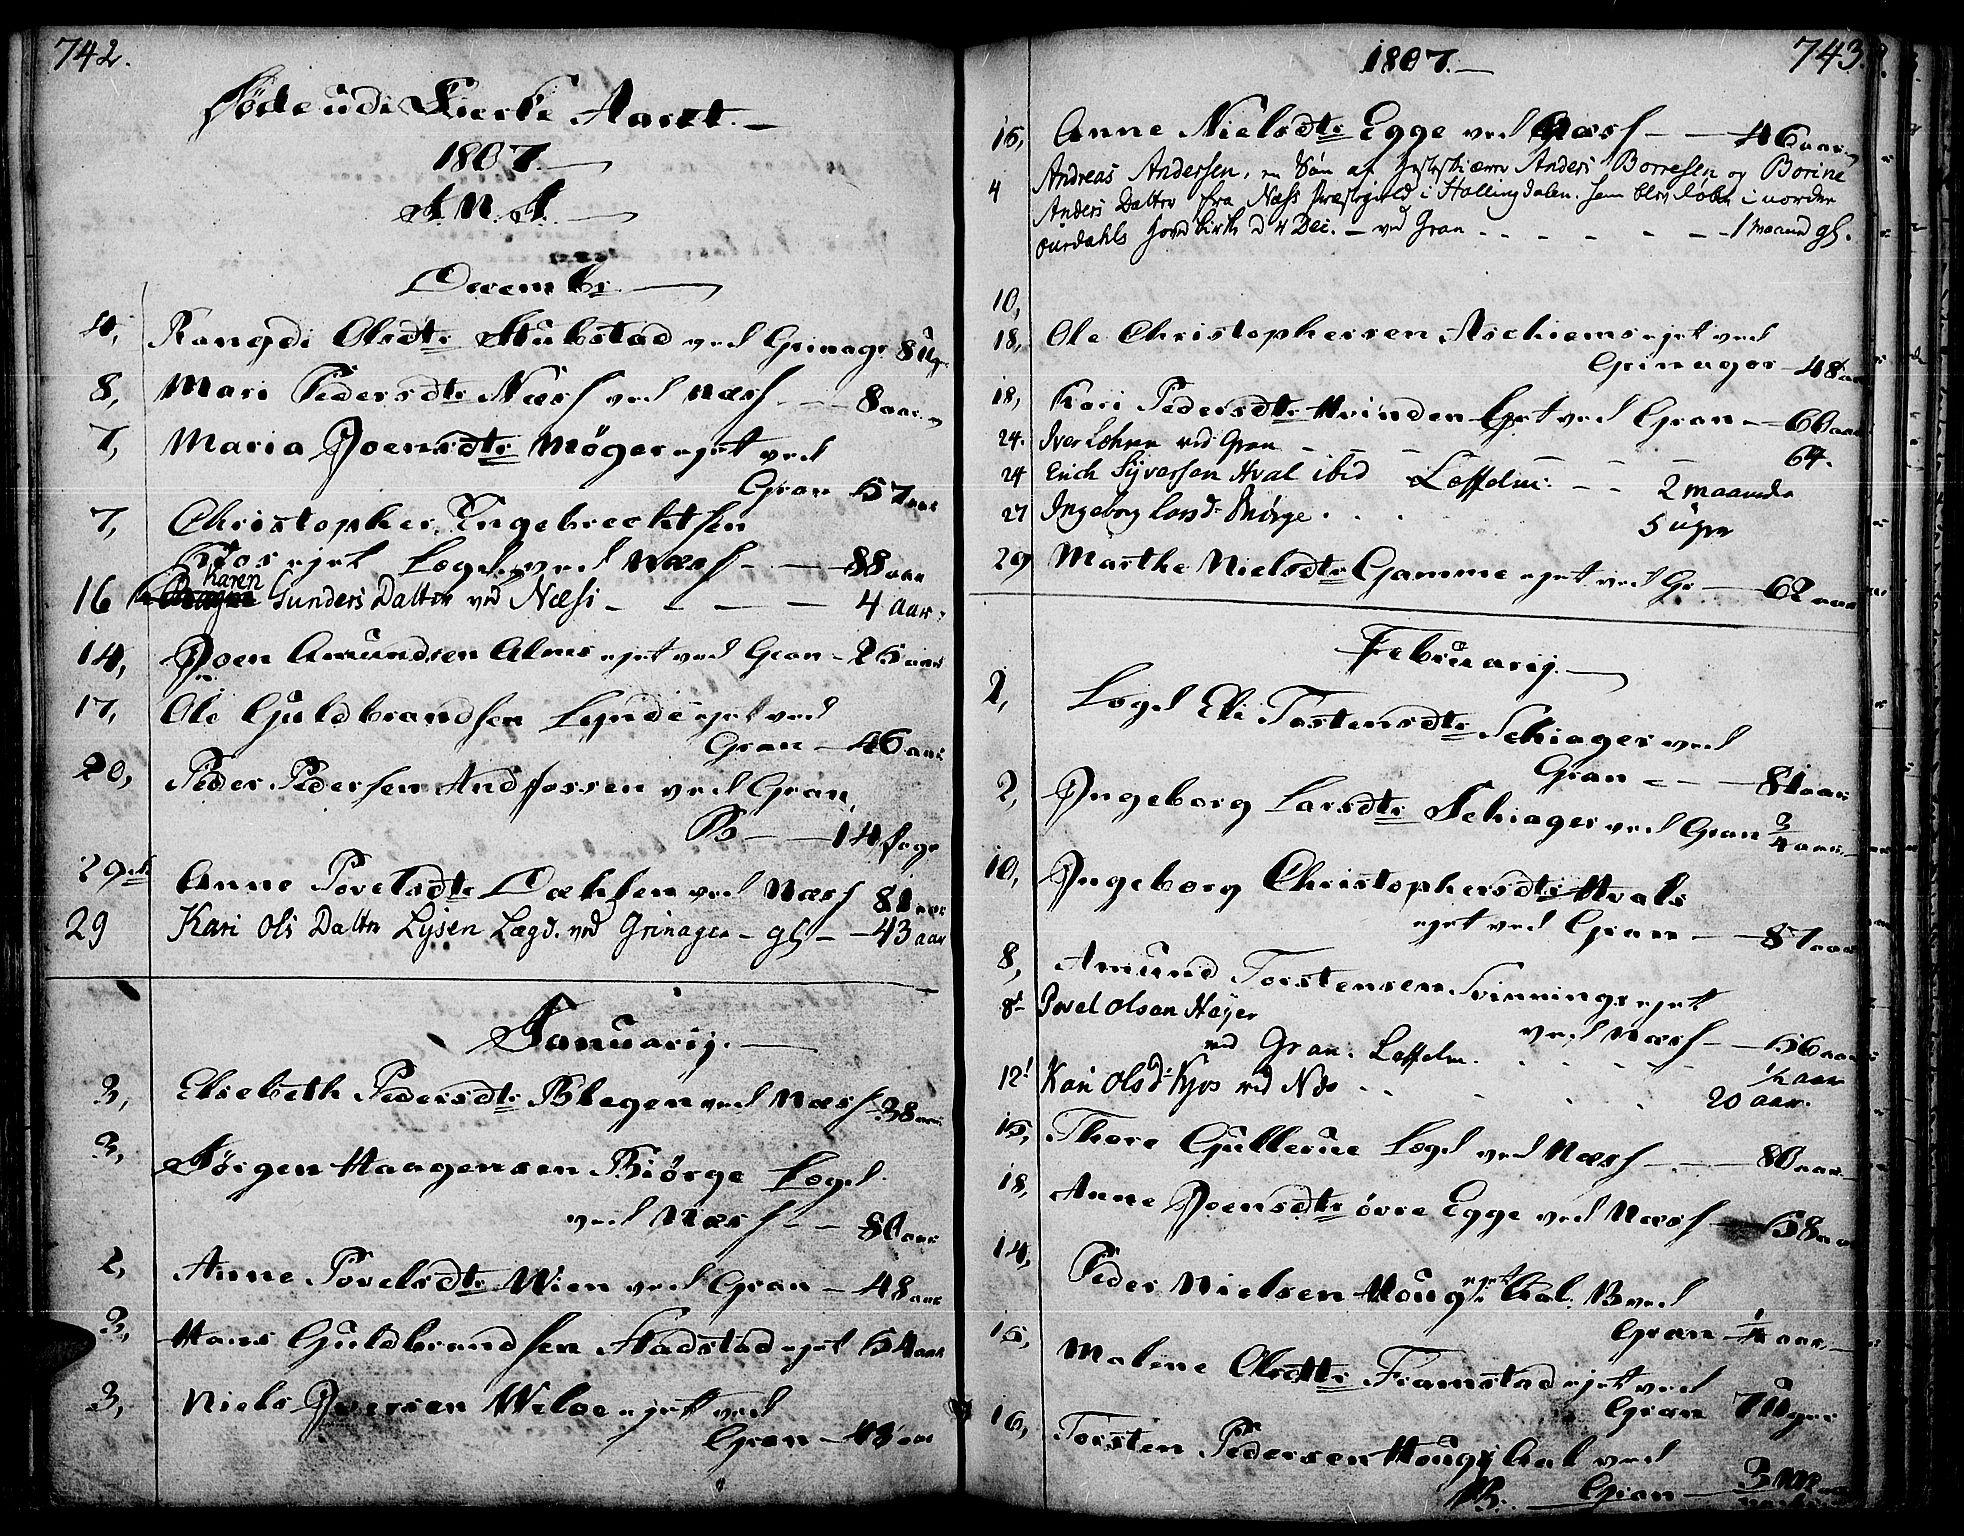 SAH, Gran prestekontor, Ministerialbok nr. 6, 1787-1824, s. 742-743